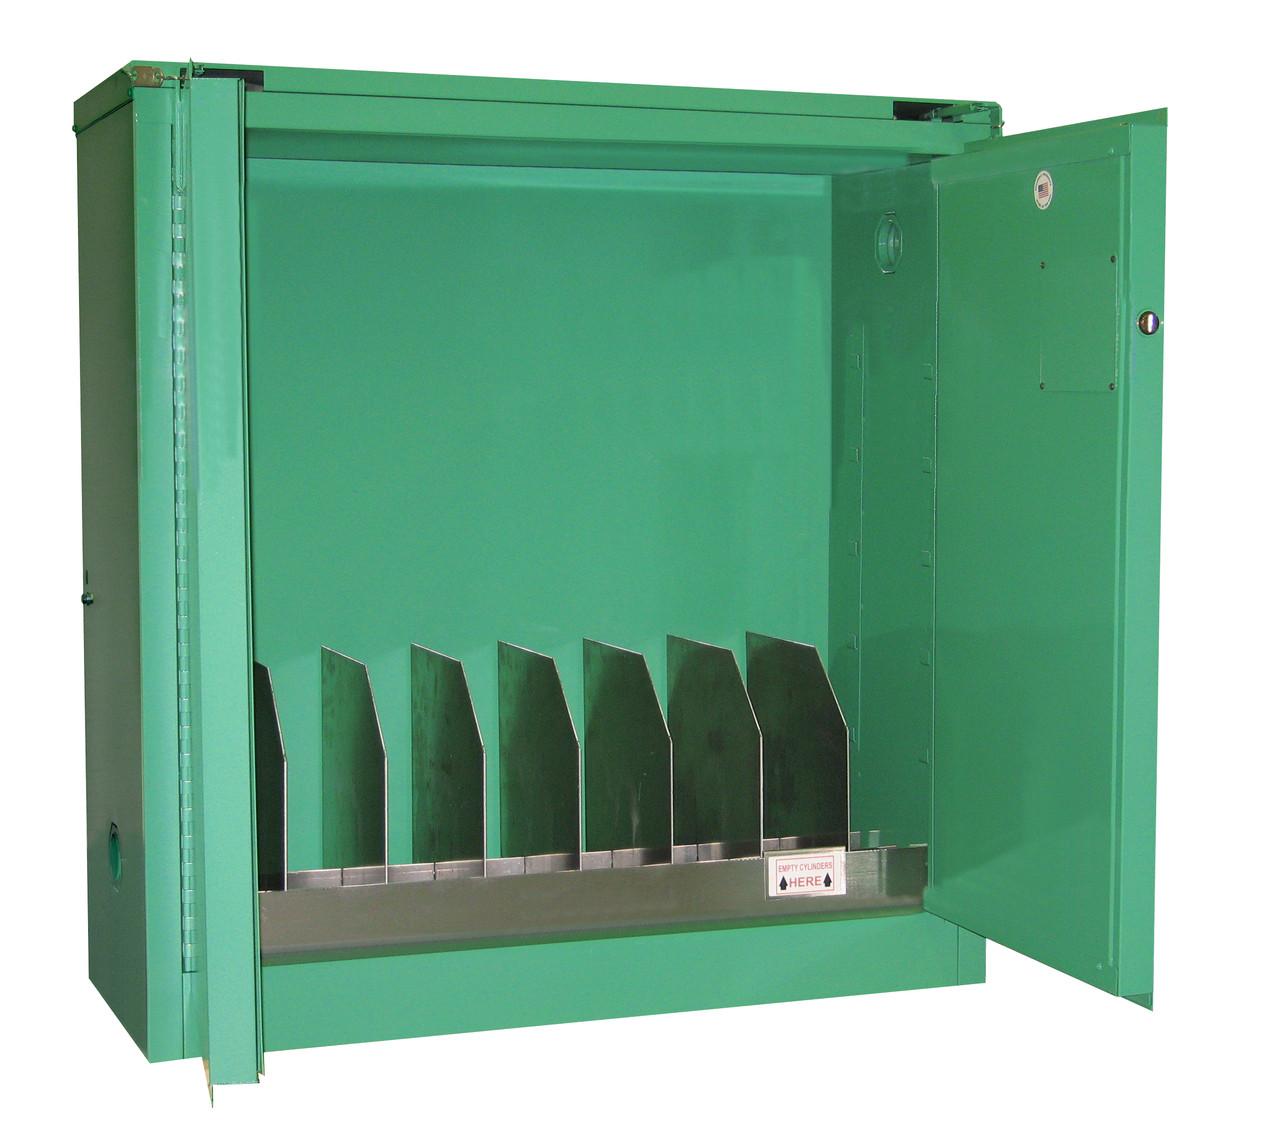 Medical Gas Cylinder Cabinet 21 24 Cylinders Self Closing